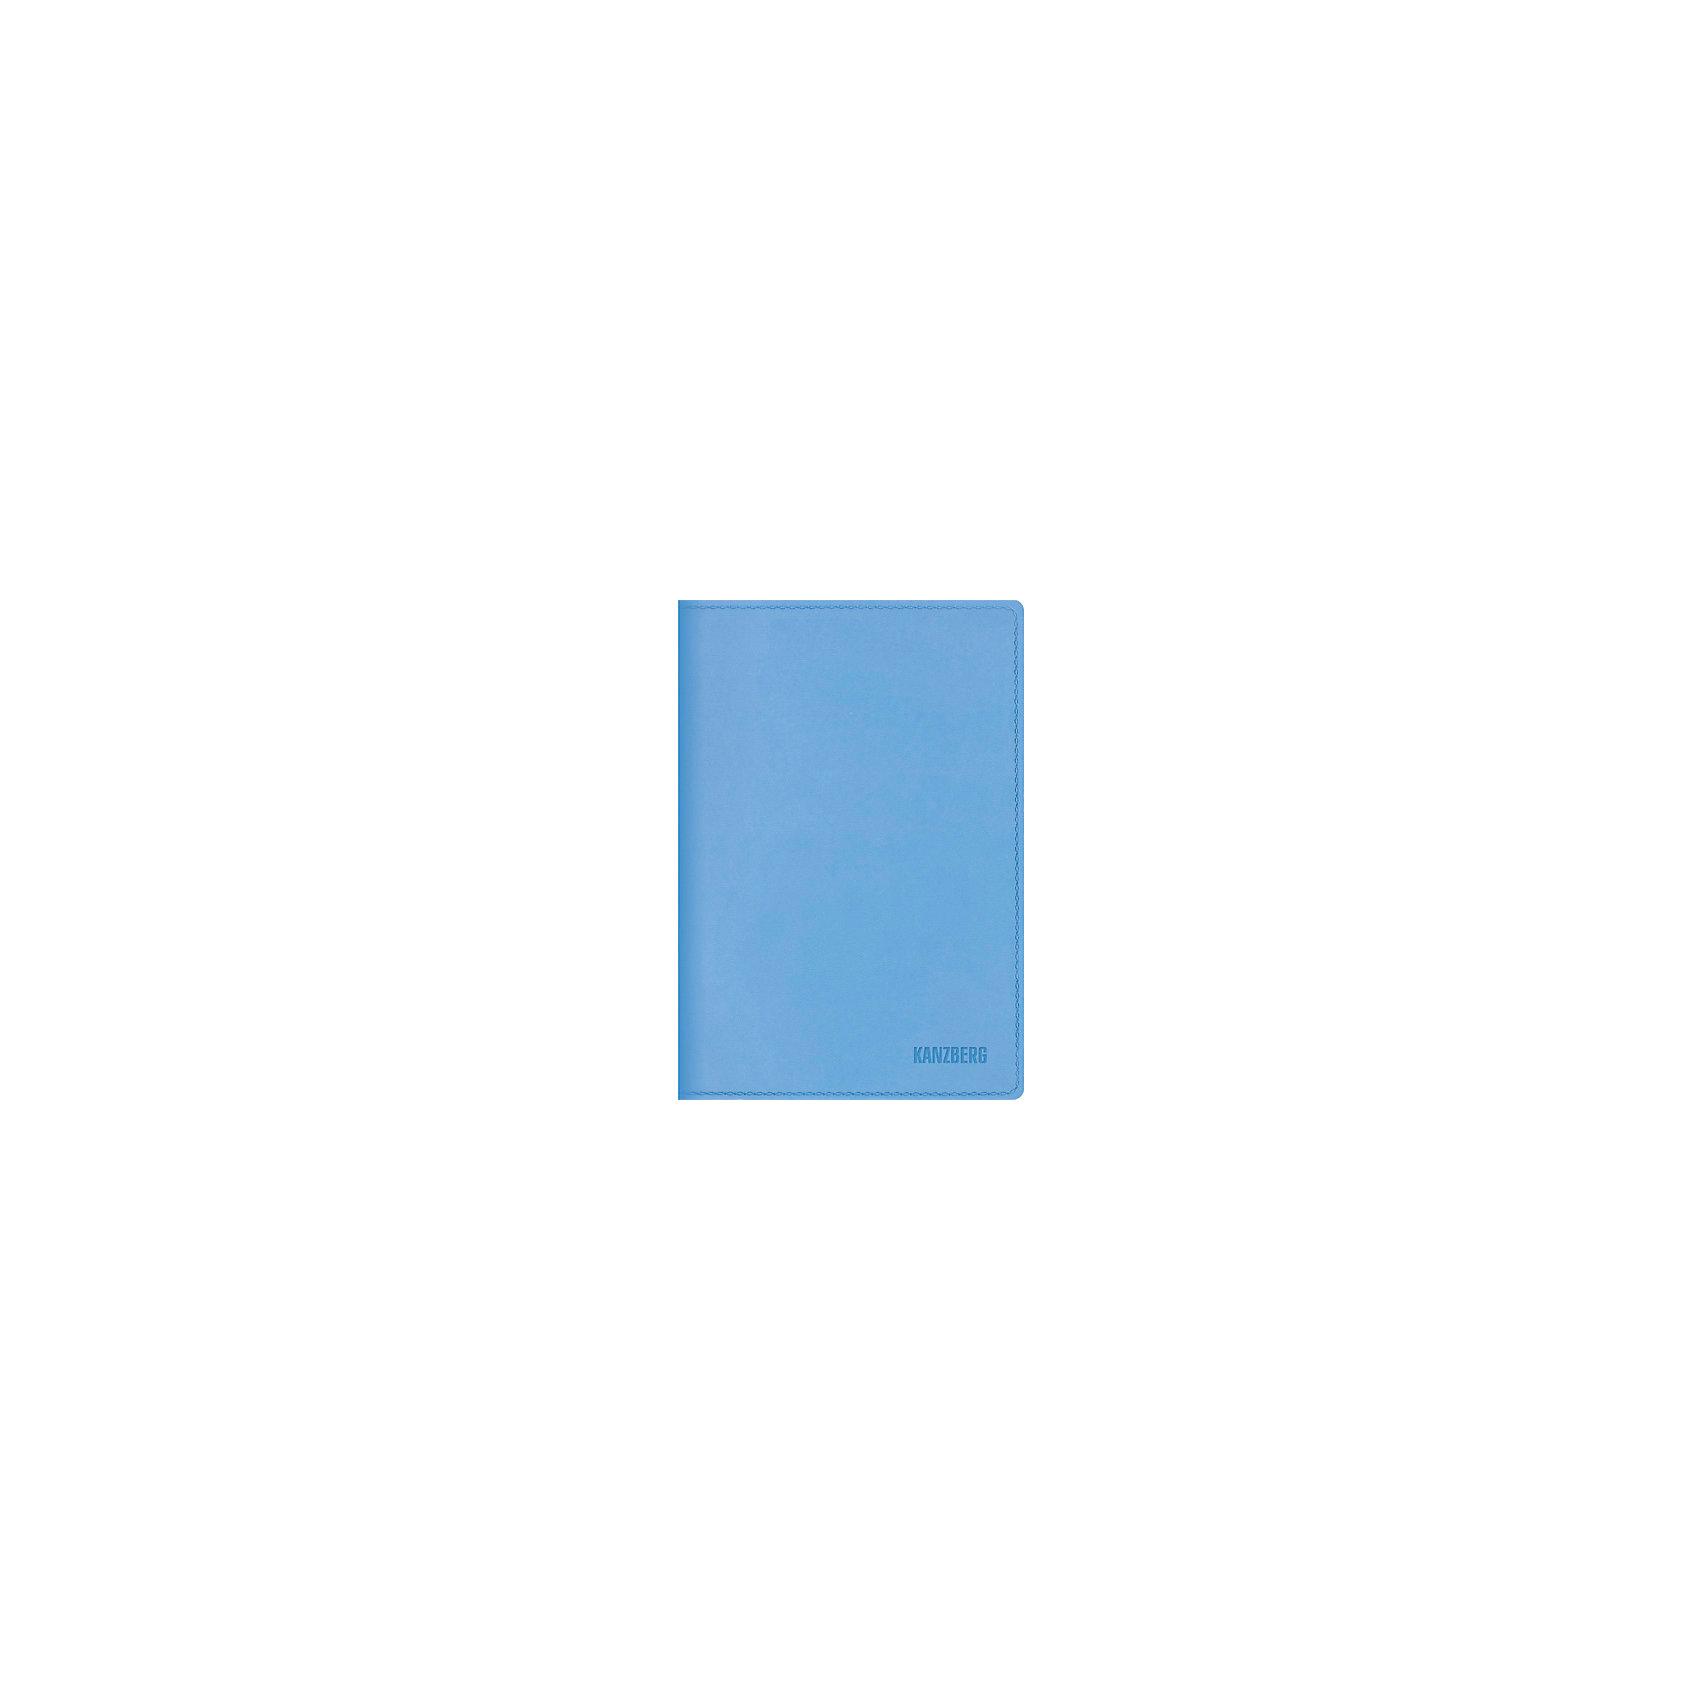 Эксмо Ежедневник голубой А6 KANZBERG, 152 л желай делай ежедневник